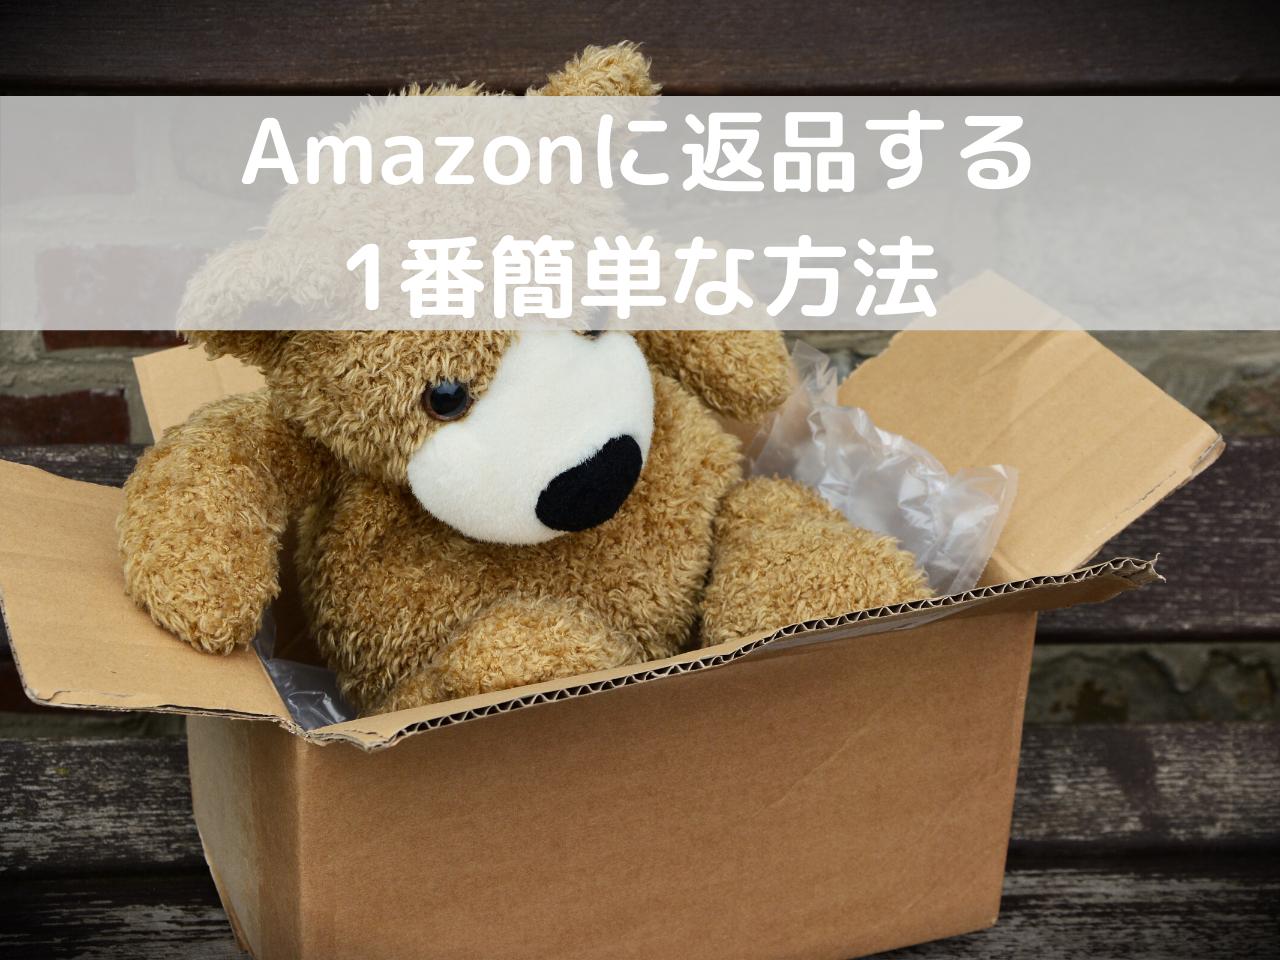 Amazonに返品する1番簡単な方法